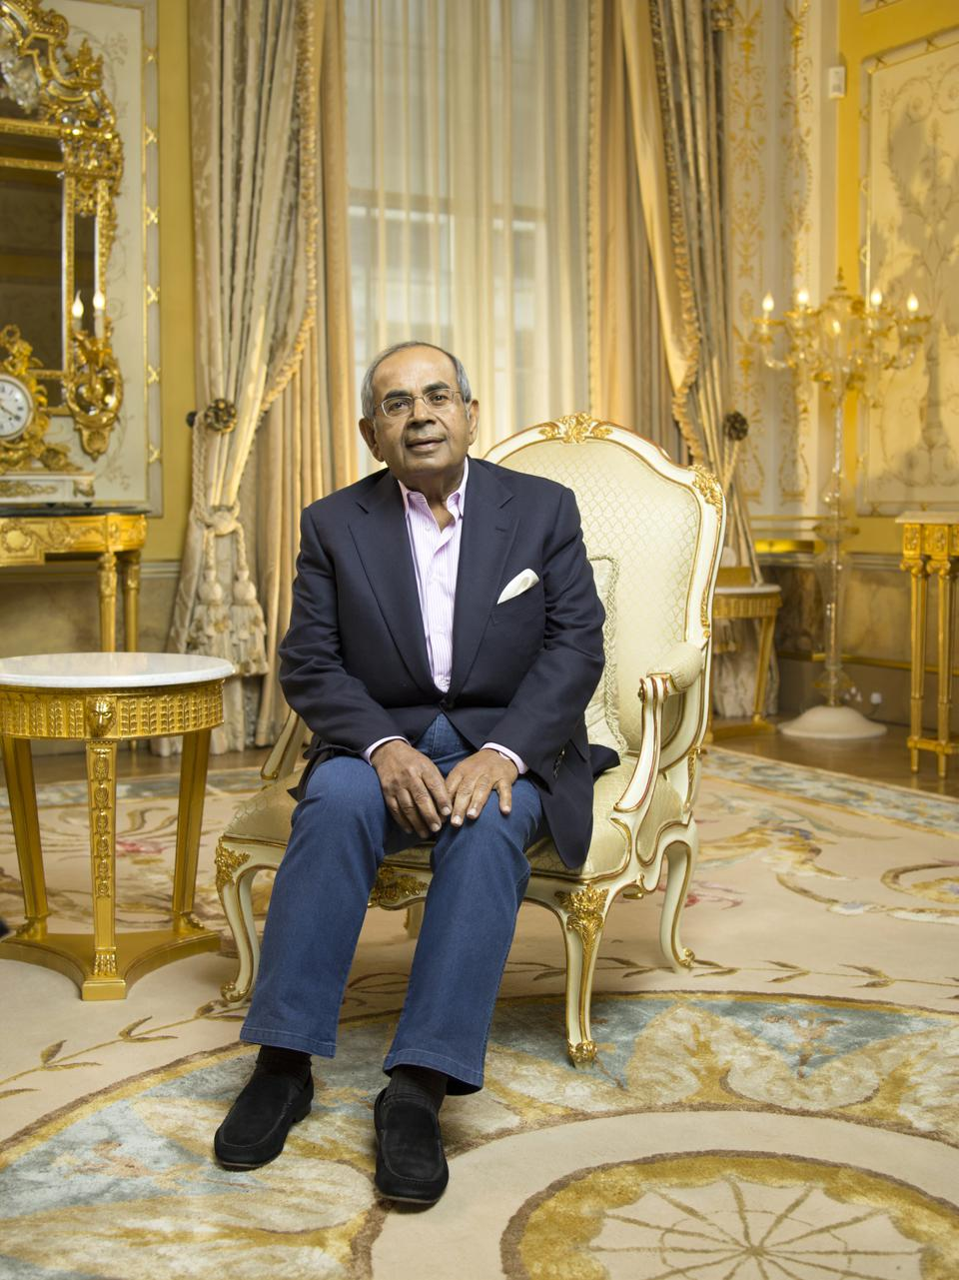 Billionaire And Hinduja Group Co-Chairman Gopichand Hinduja